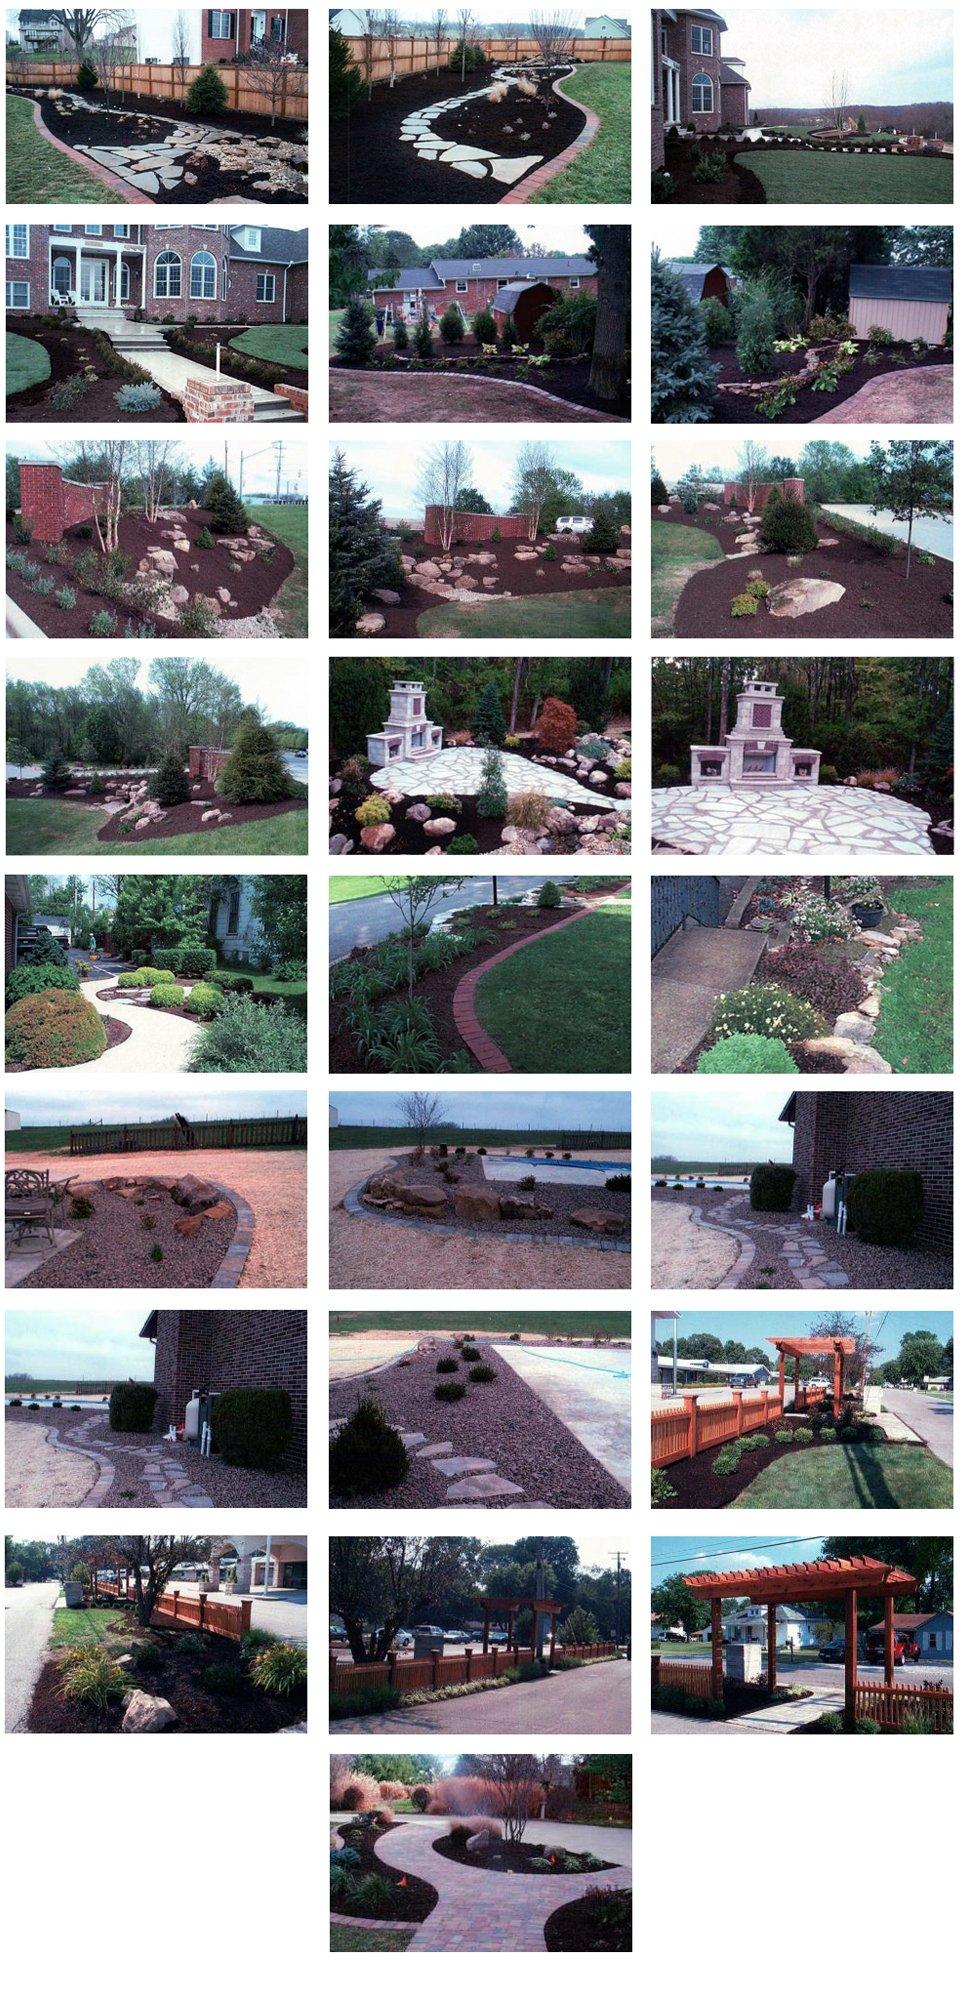 Landscape Design | Bedford, IN | Creative Environments, Inc. | 812-279-3224